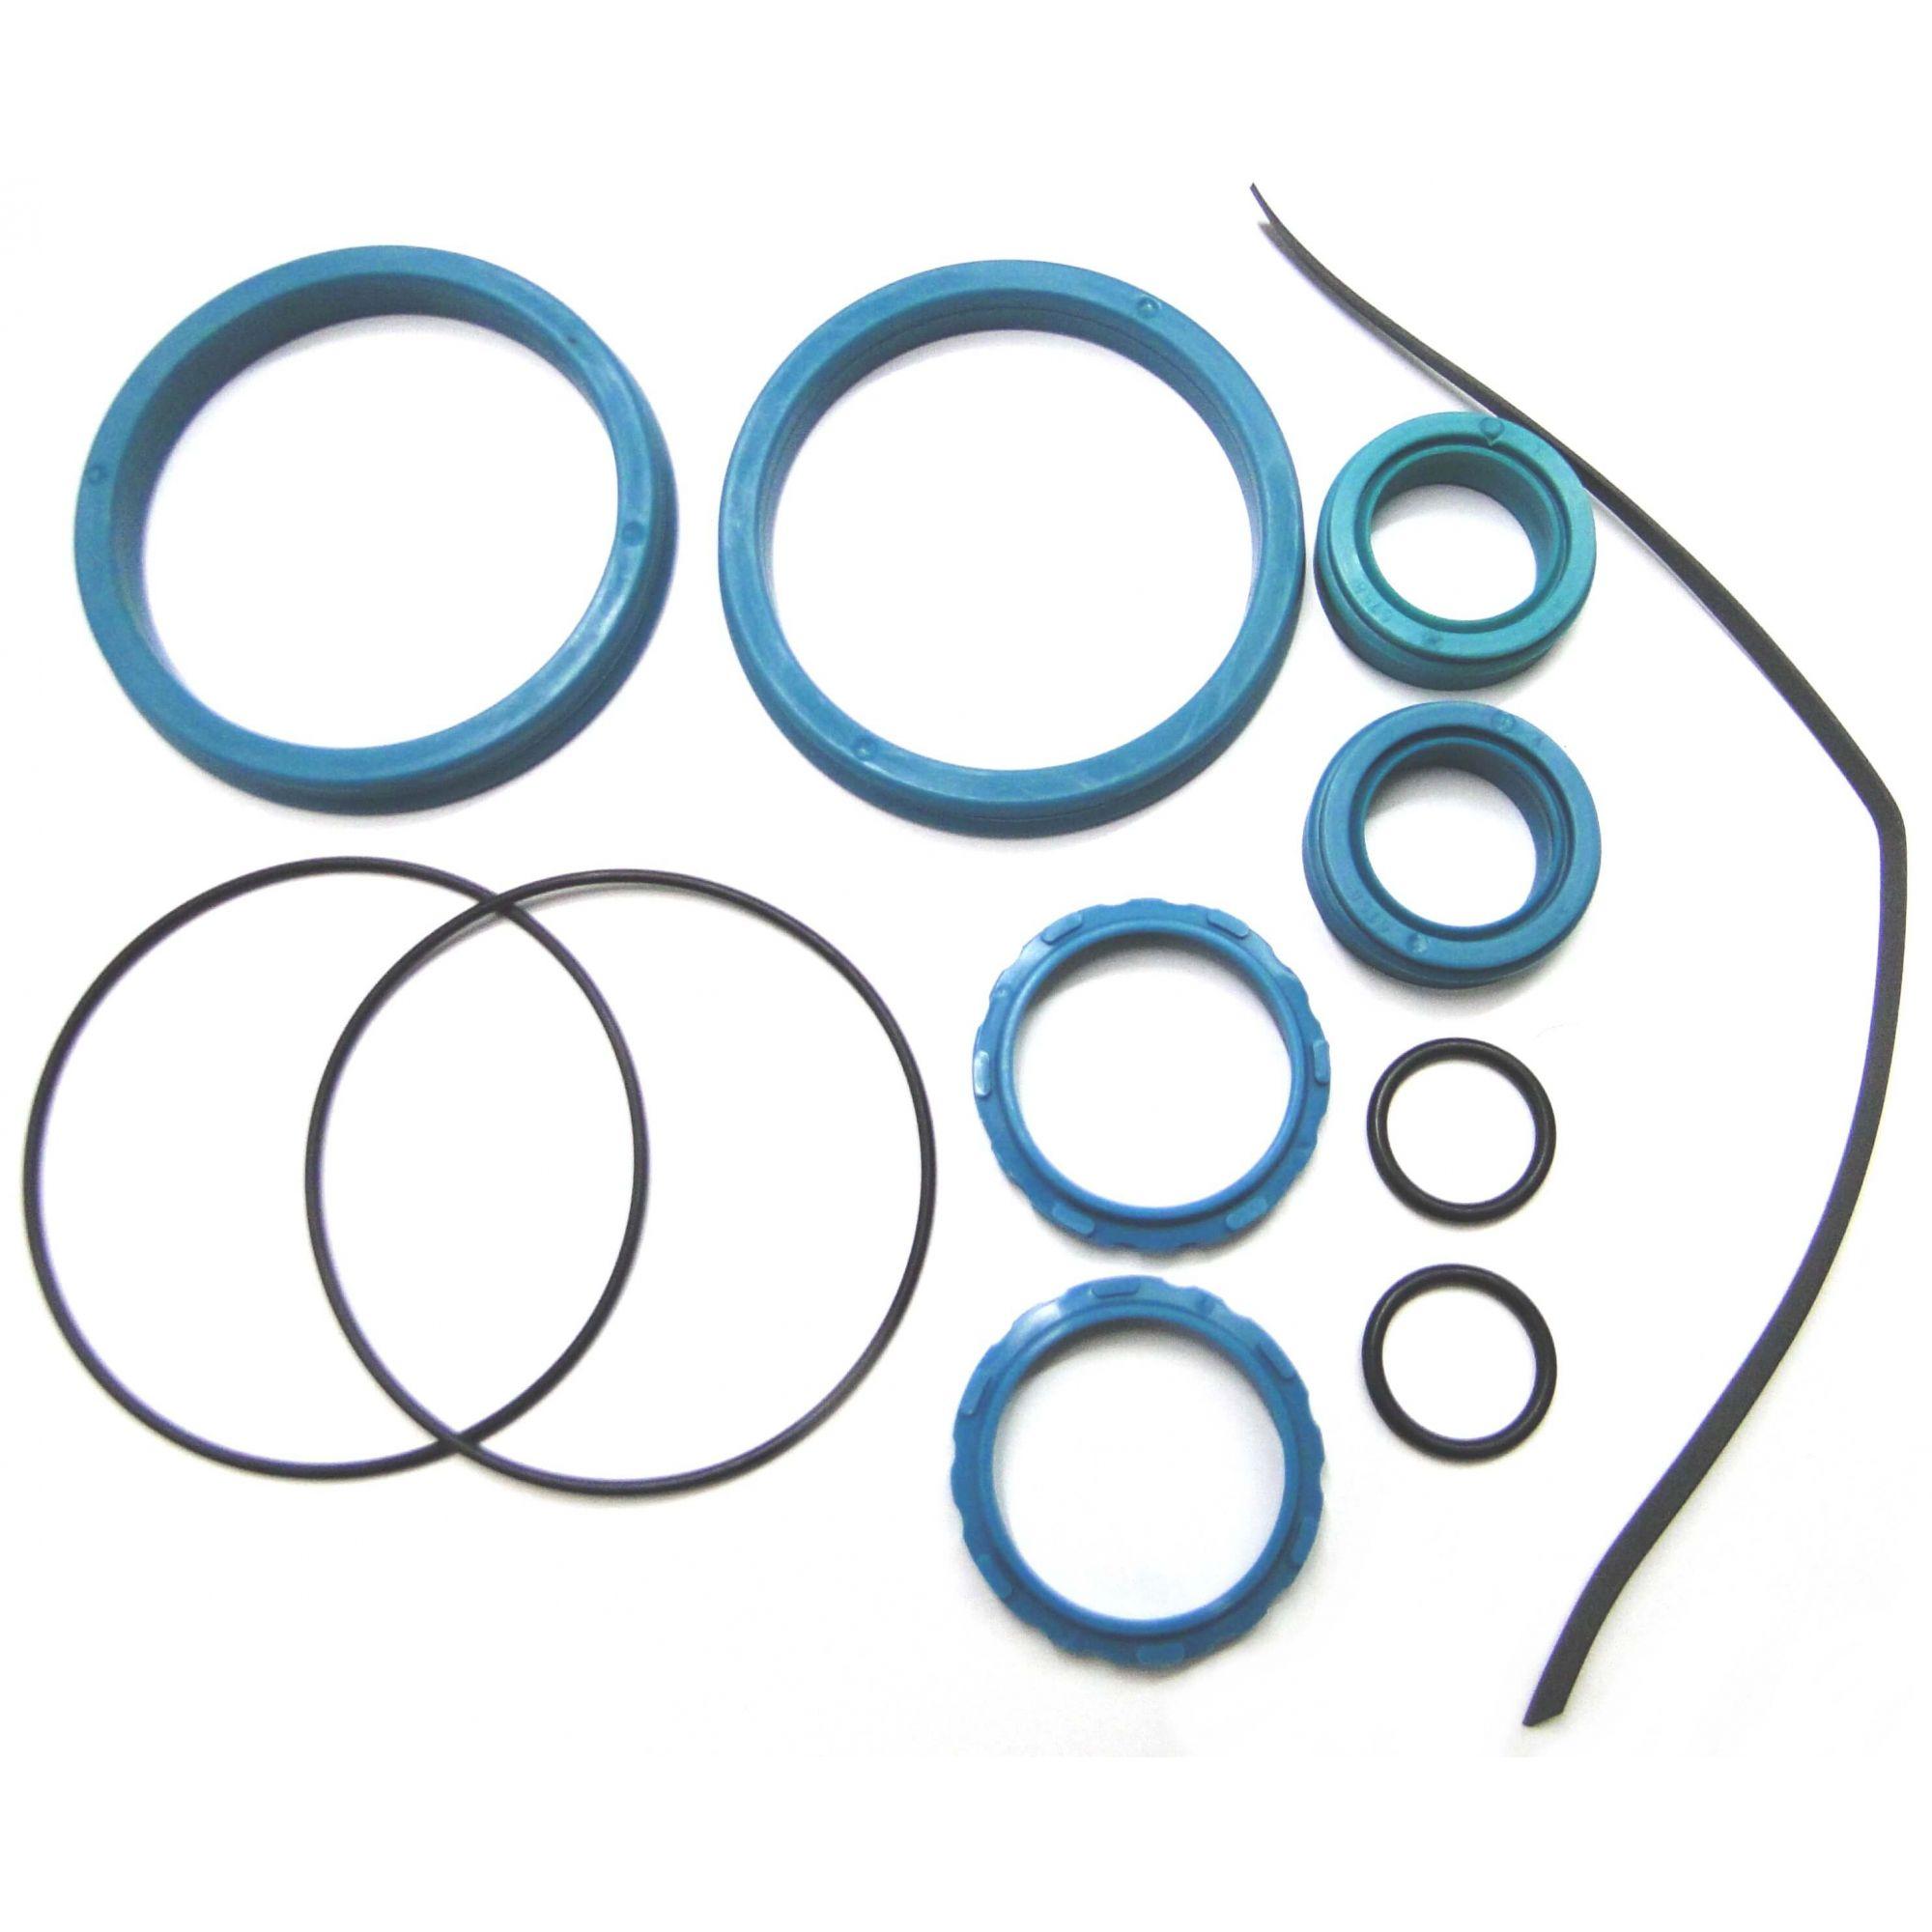 Kit Reparo para Cilindro Pneumático Haste Dupla E080 Werk Schott